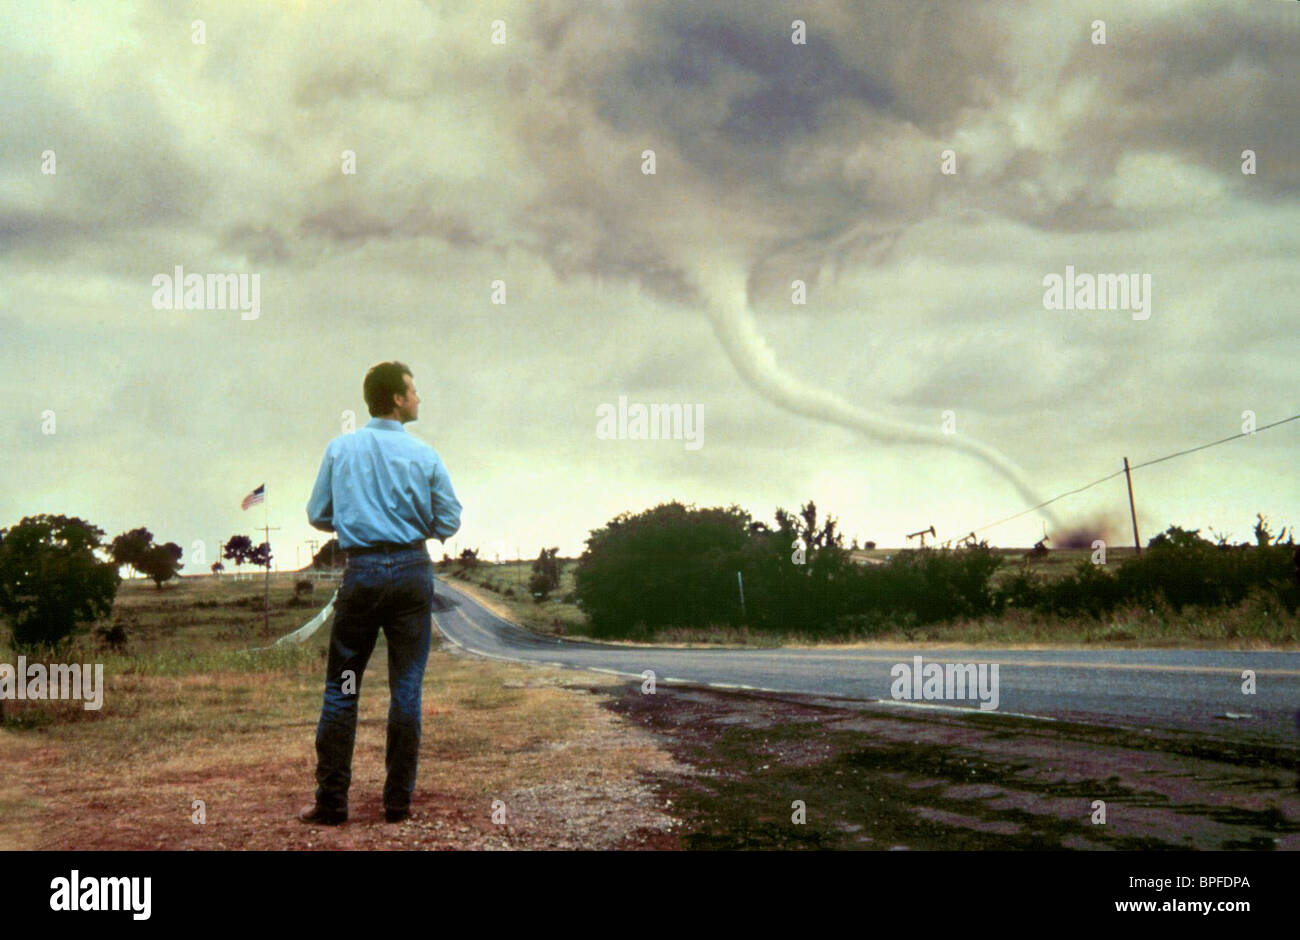 Bill Paxton Tornado Twister 1996 Stock Photo Alamy